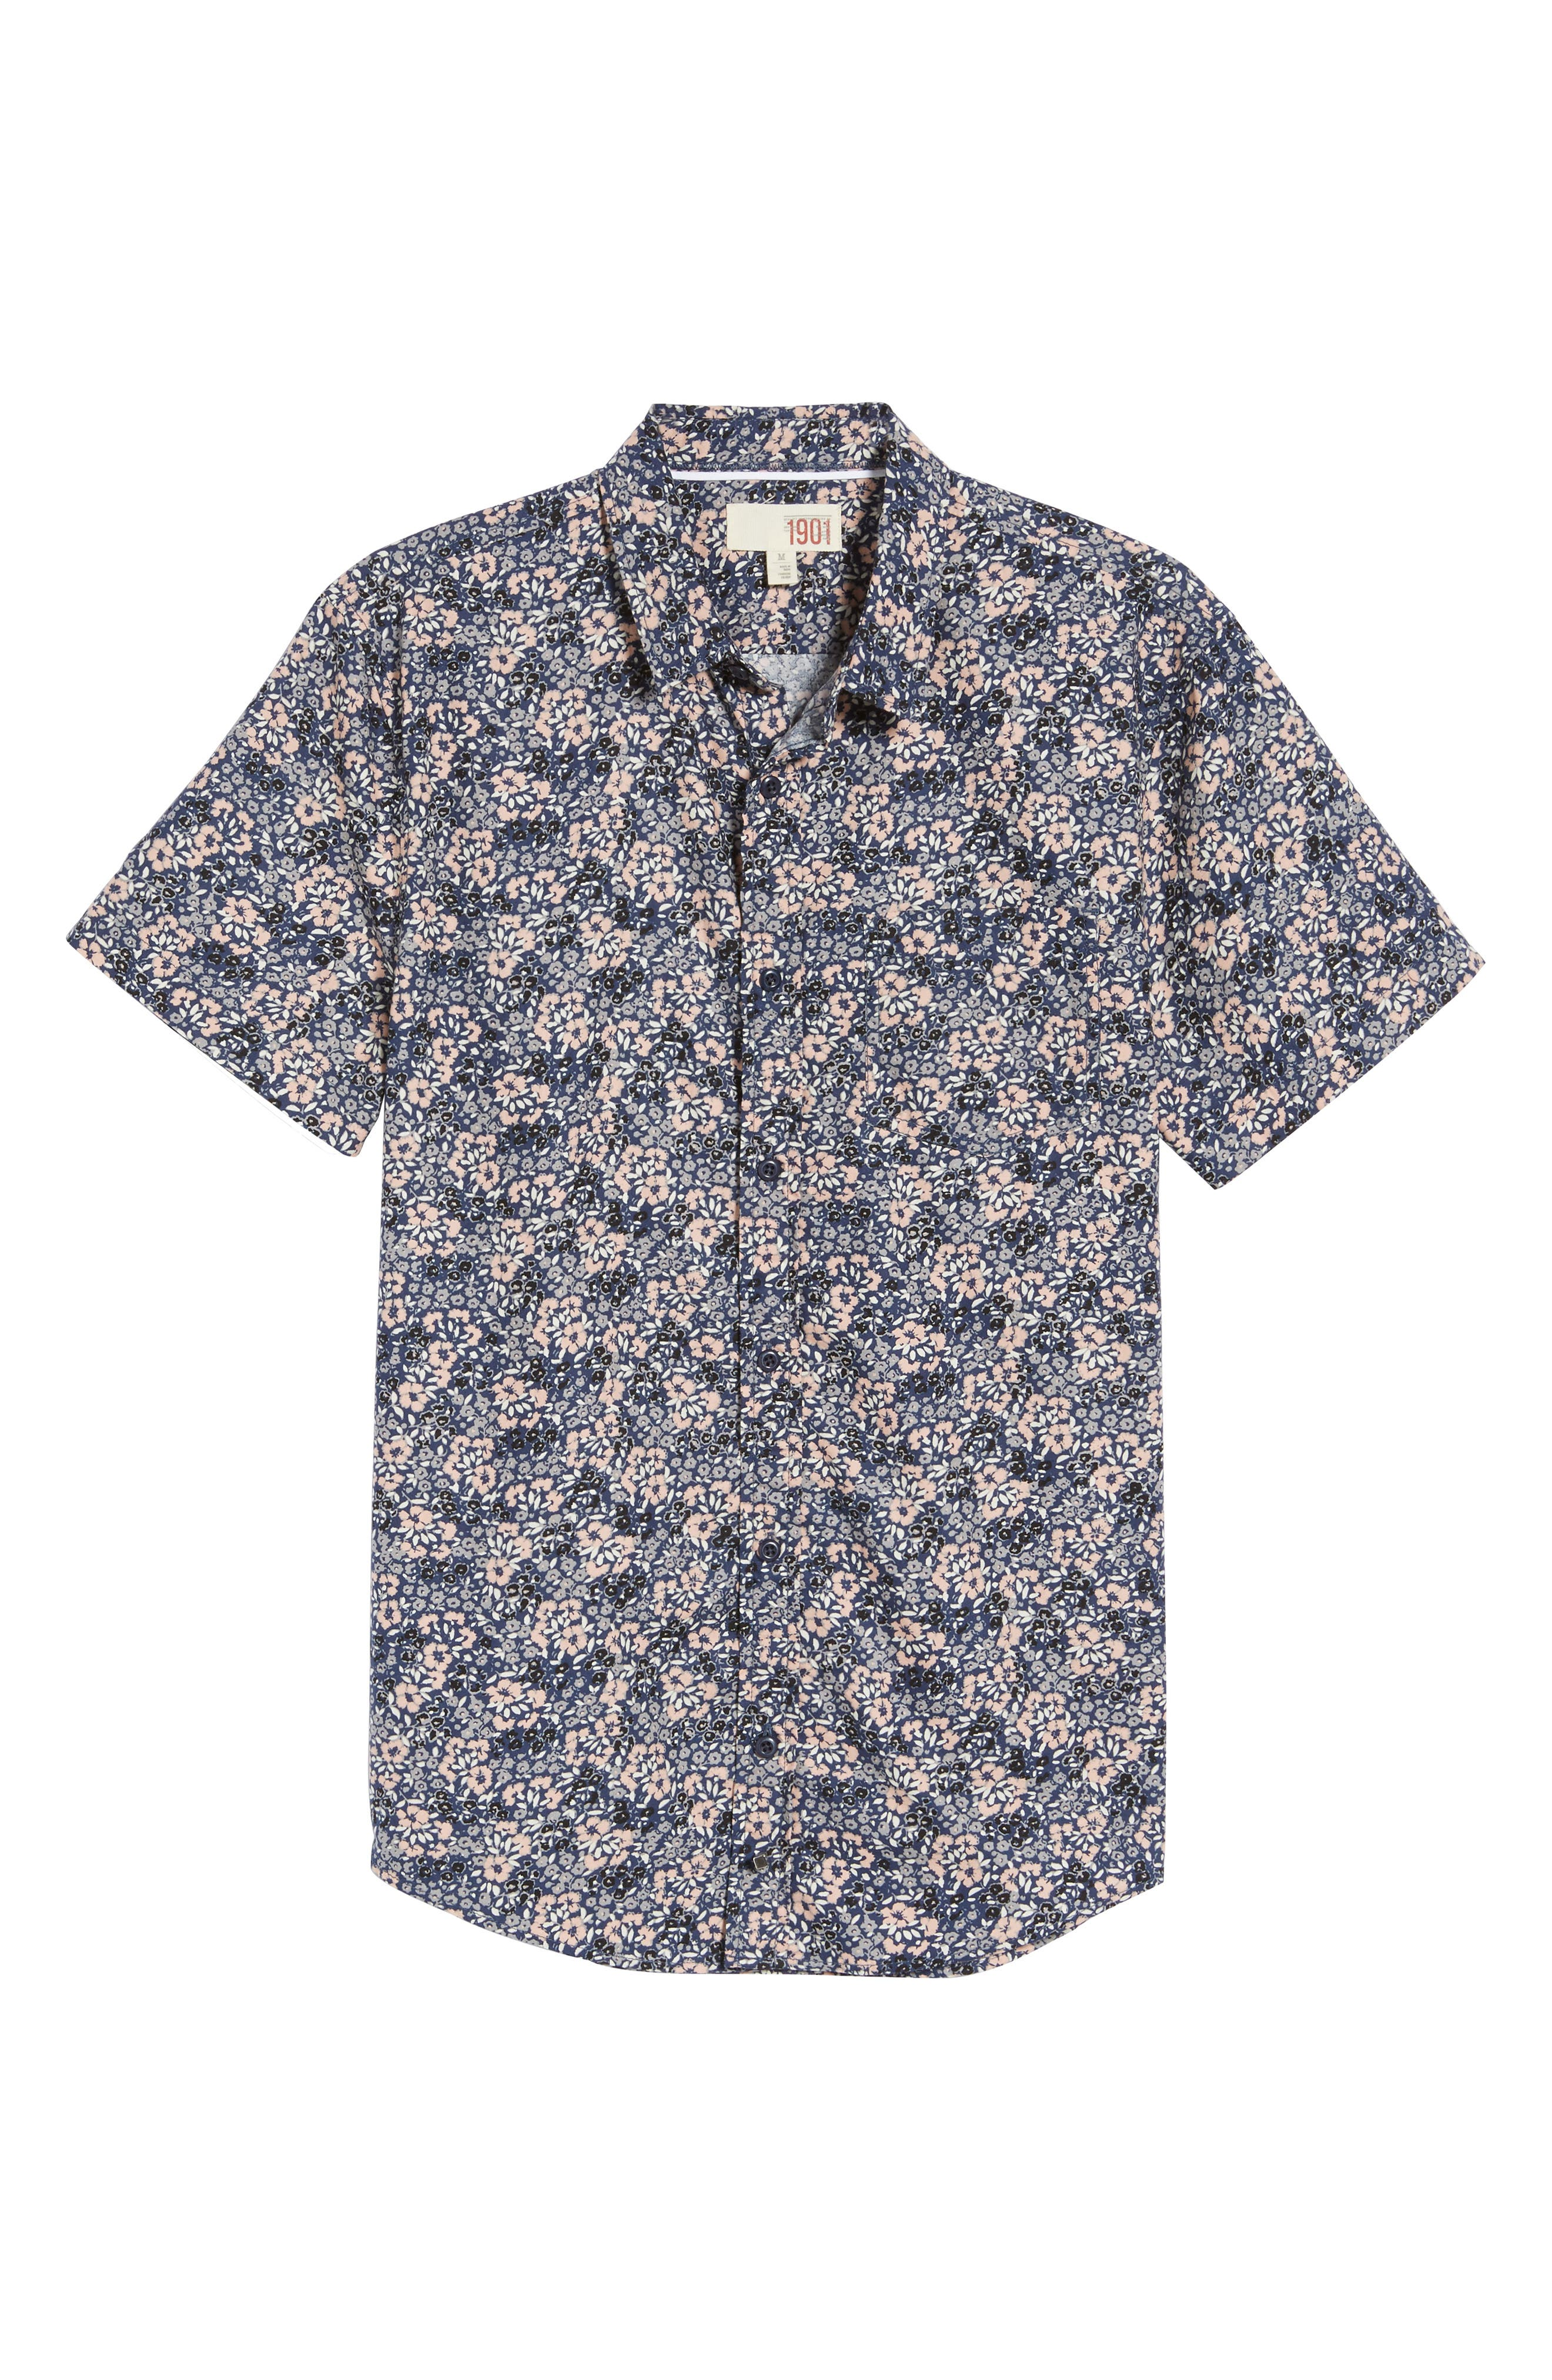 Poplin Floral Shirt,                             Alternate thumbnail 7, color,                             Navy Peacoat Simple Floral